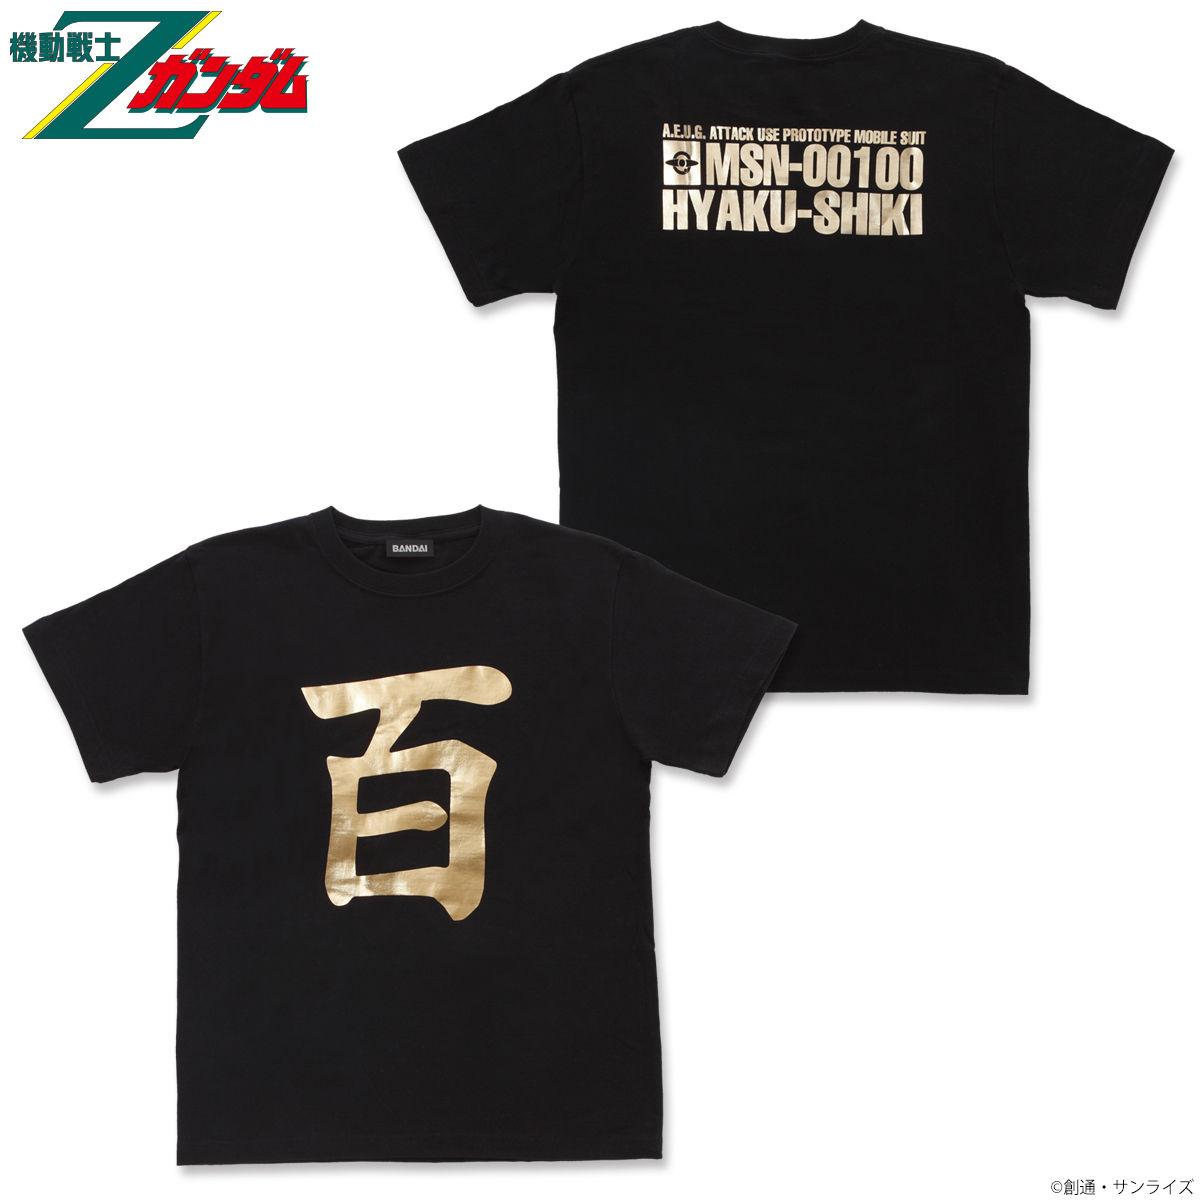 Mobile Suit Zeta Gundam MSN-00100 T-shirt